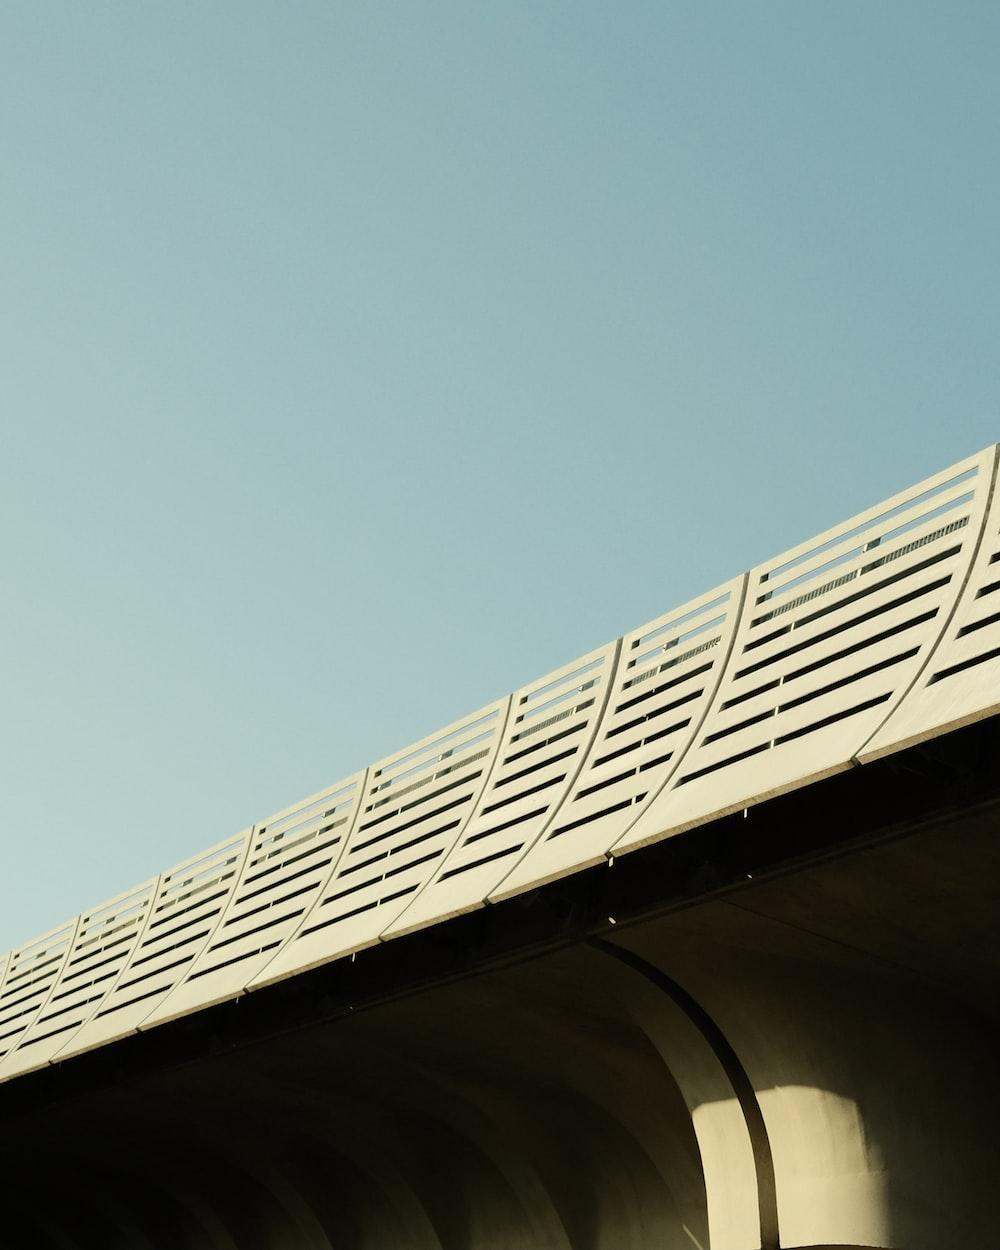 white metal frame under blue sky during daytime